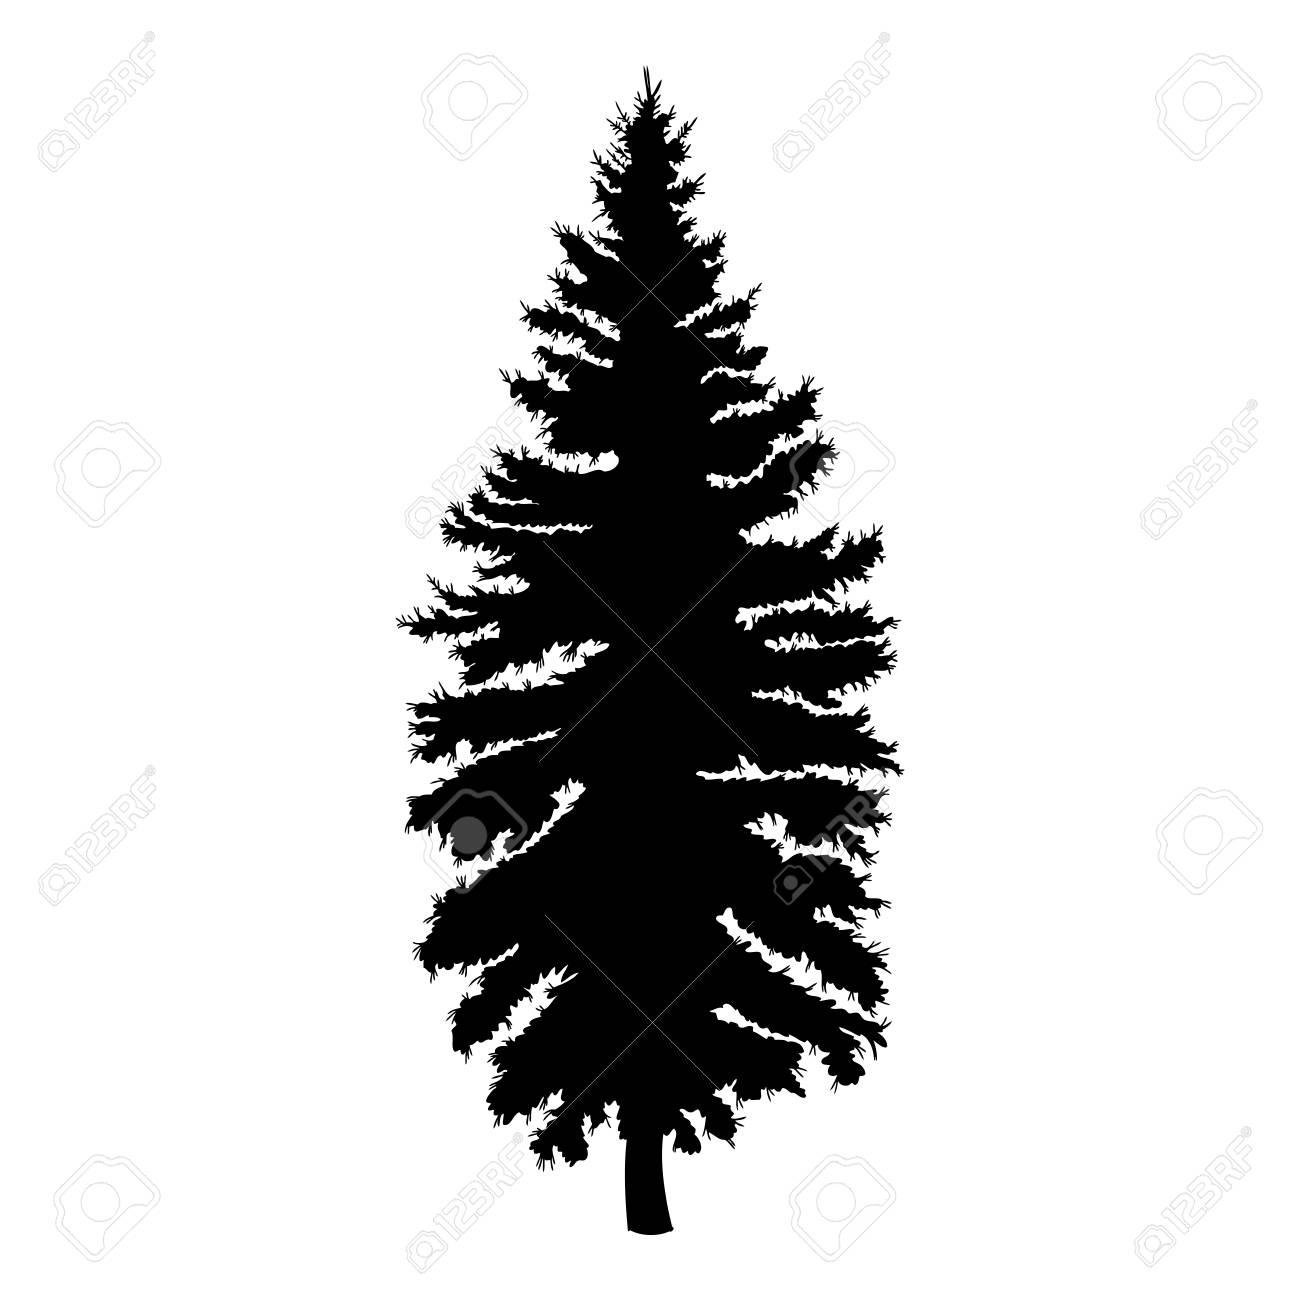 Hand Drawn Fir Tree Vector Illustration Silhouette Of Black